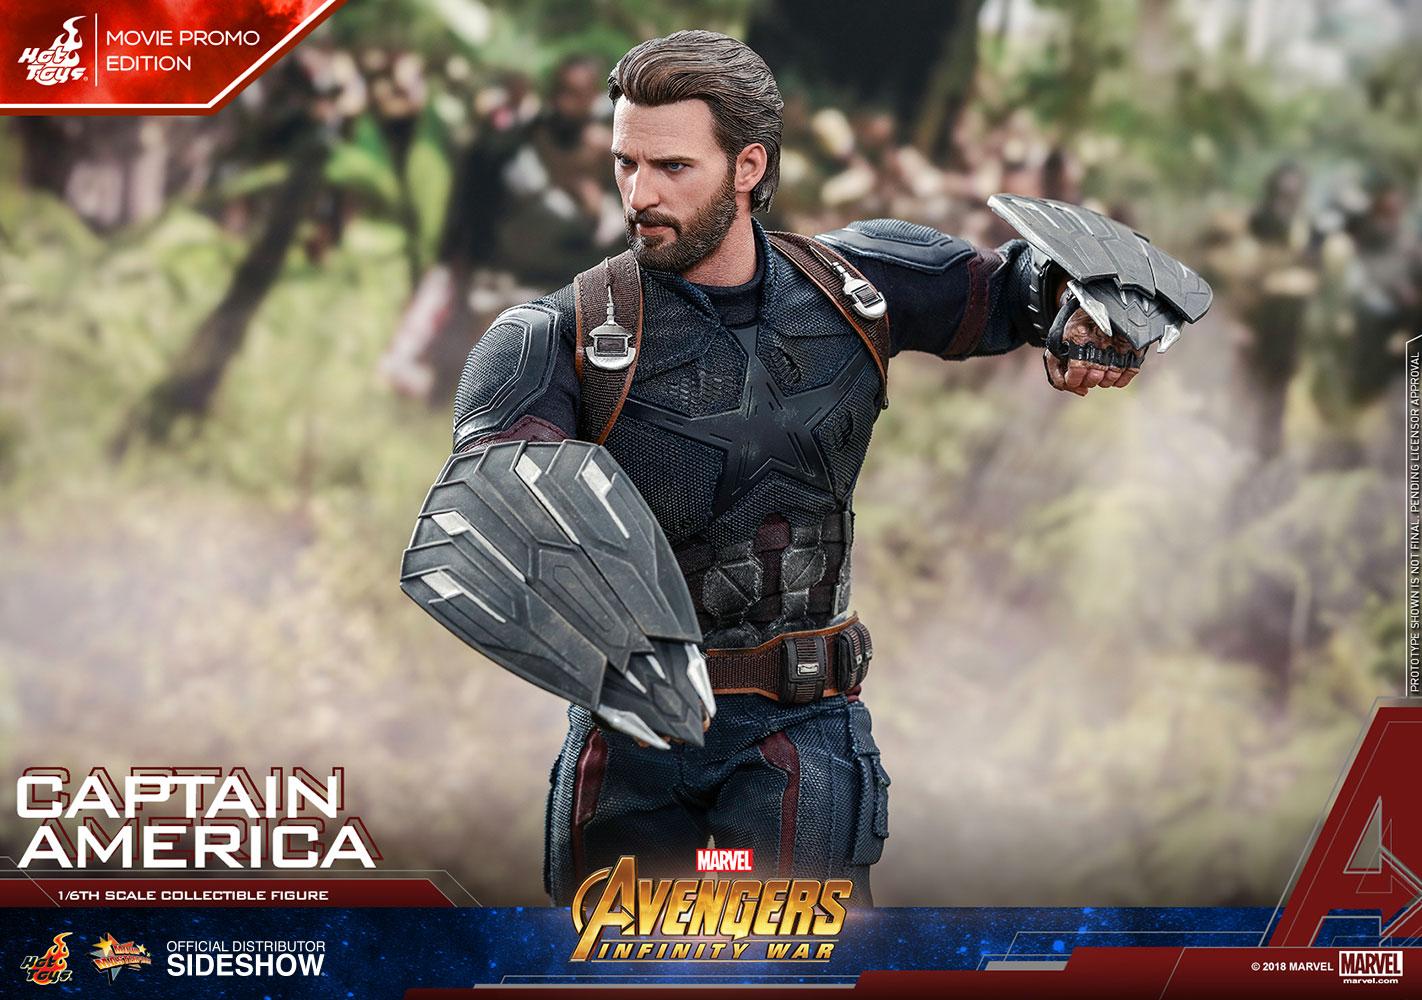 marvel captain america movie promo edition sixth scale figur